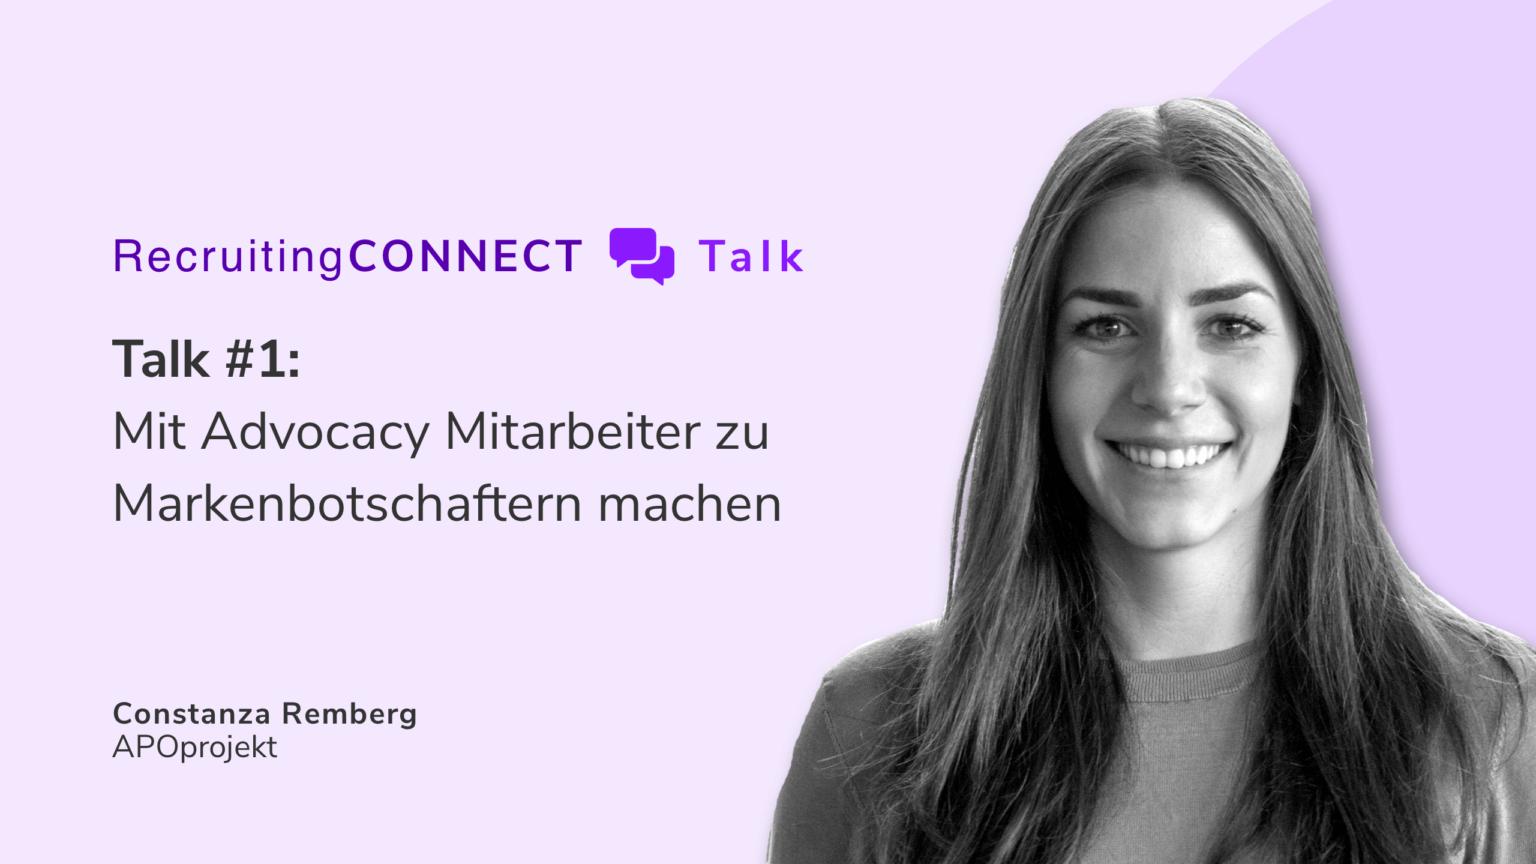 Talentry RecruitingCONNECT Talk Customer Interview APOprojekt